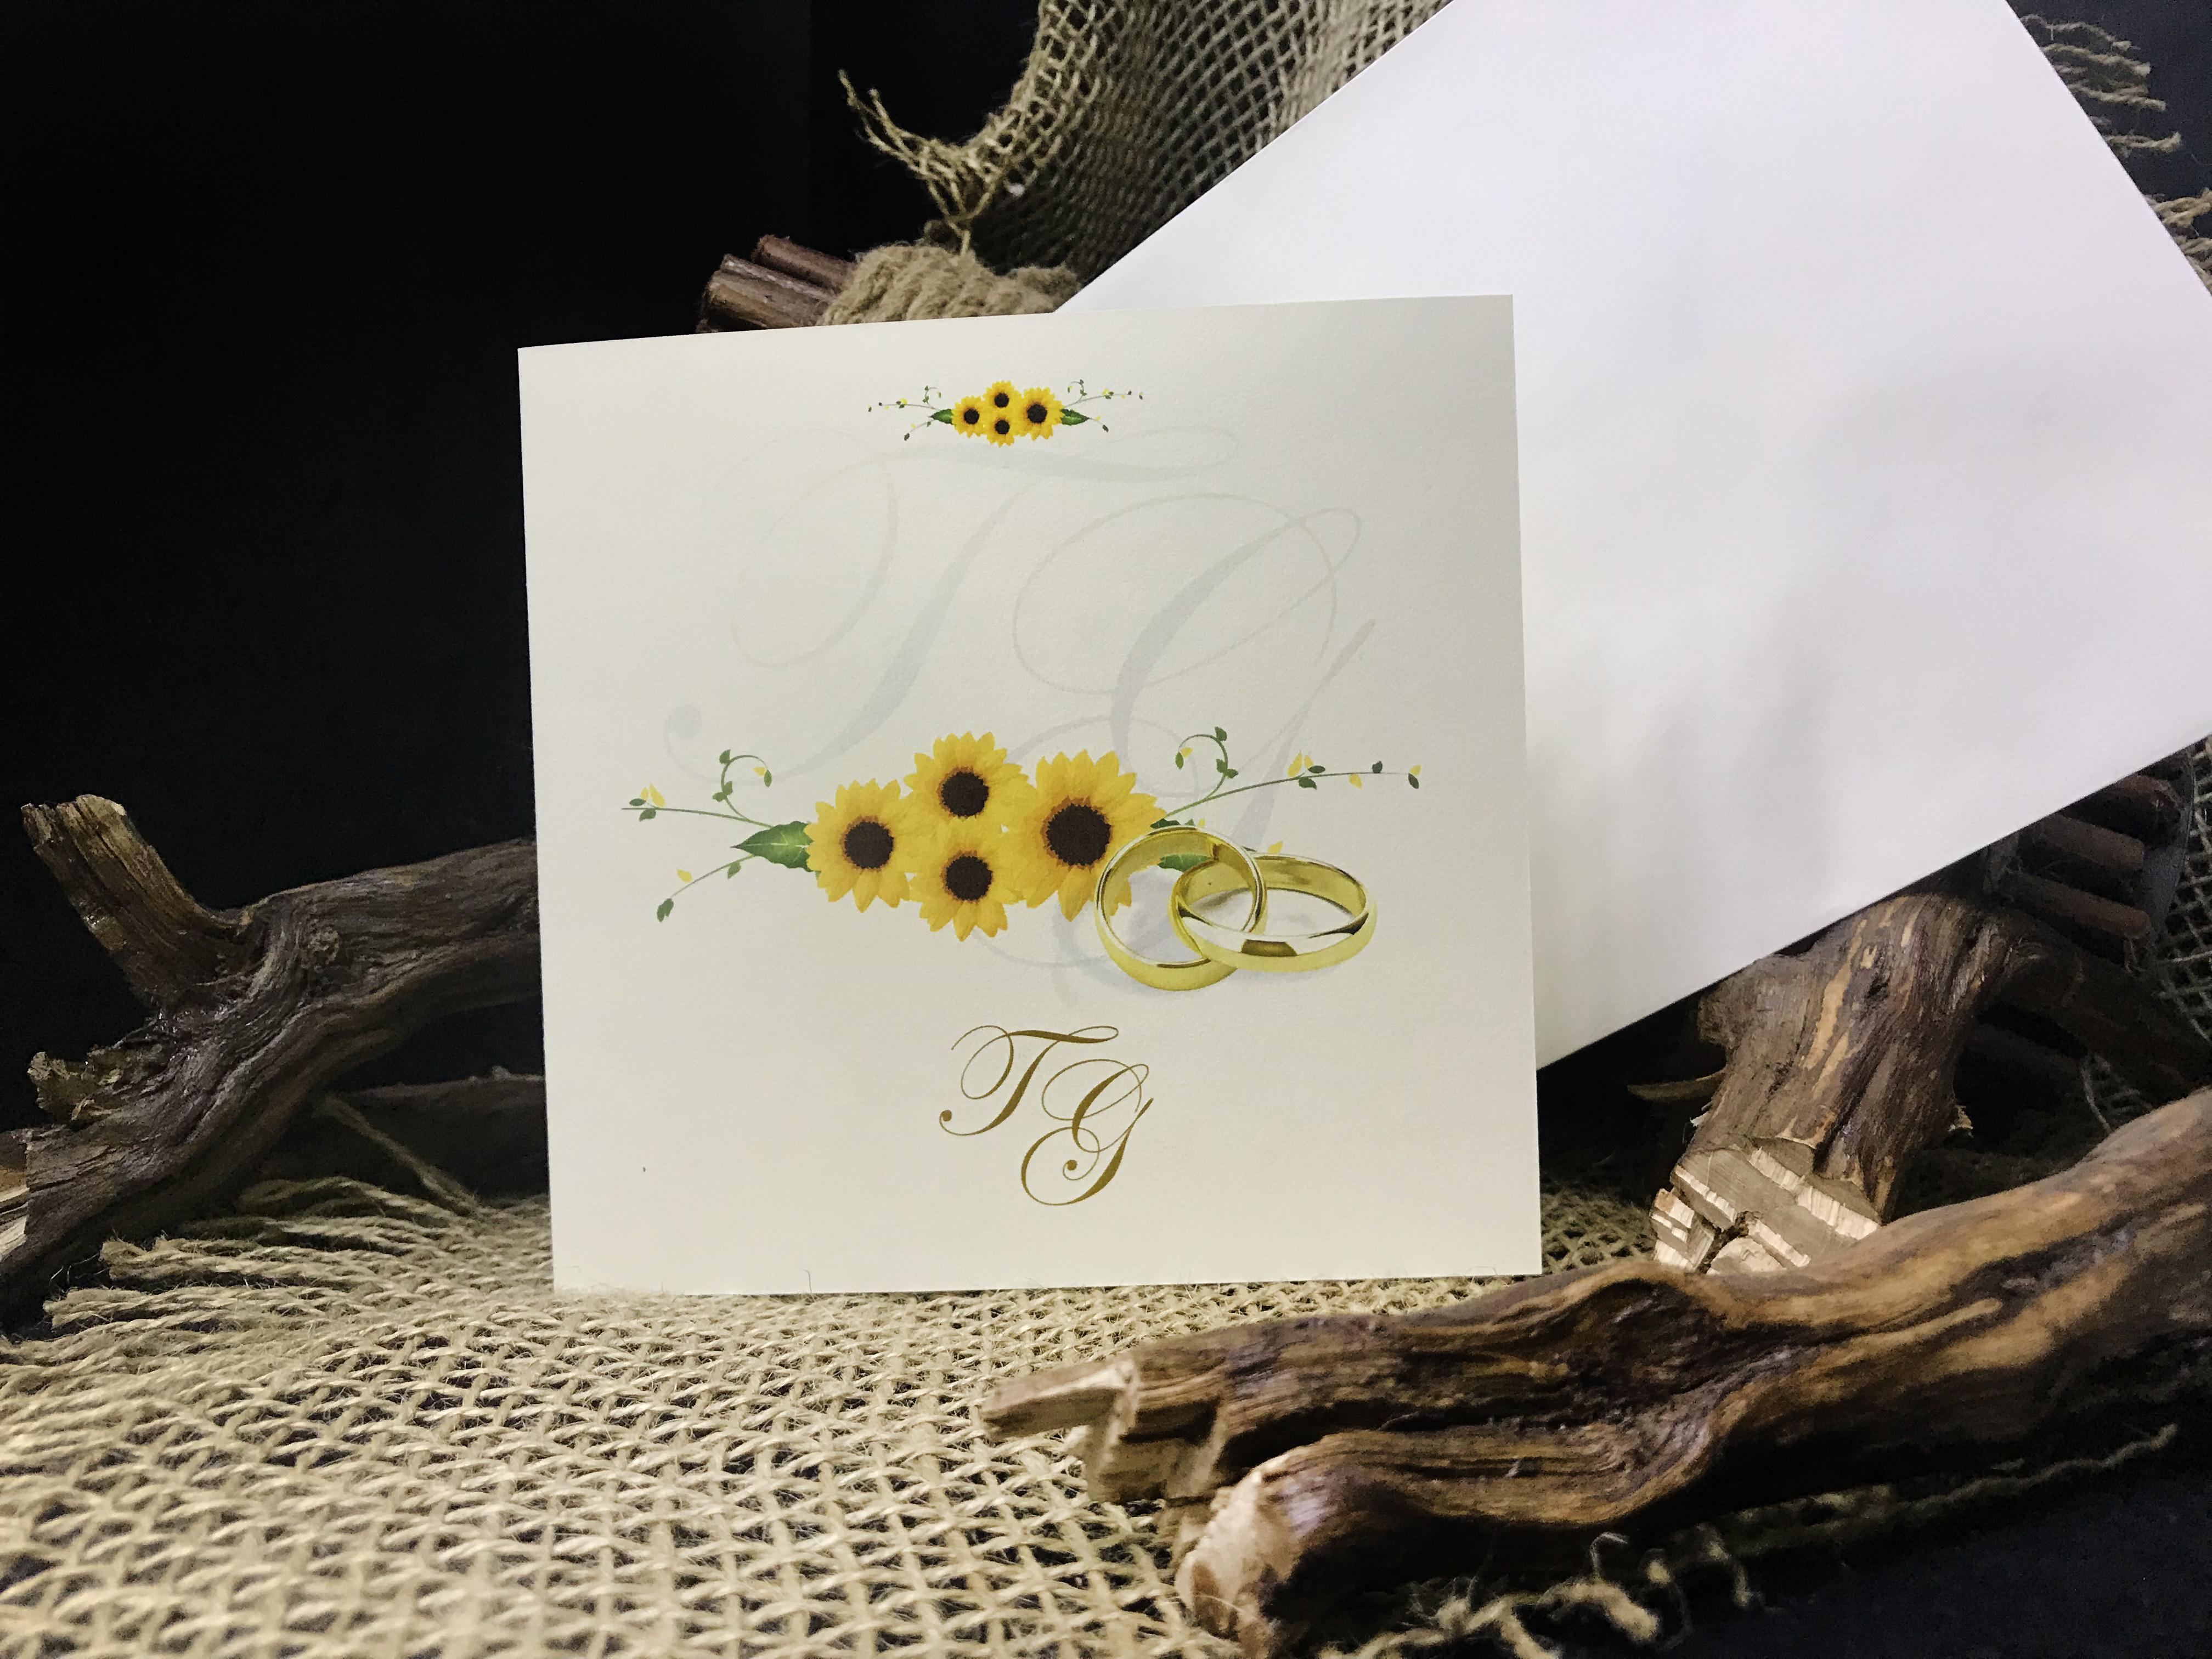 Partecipazioni Matrimonio Girasoli.I Girasoli Lagigroup Tipografia E Stampa Digitale Online